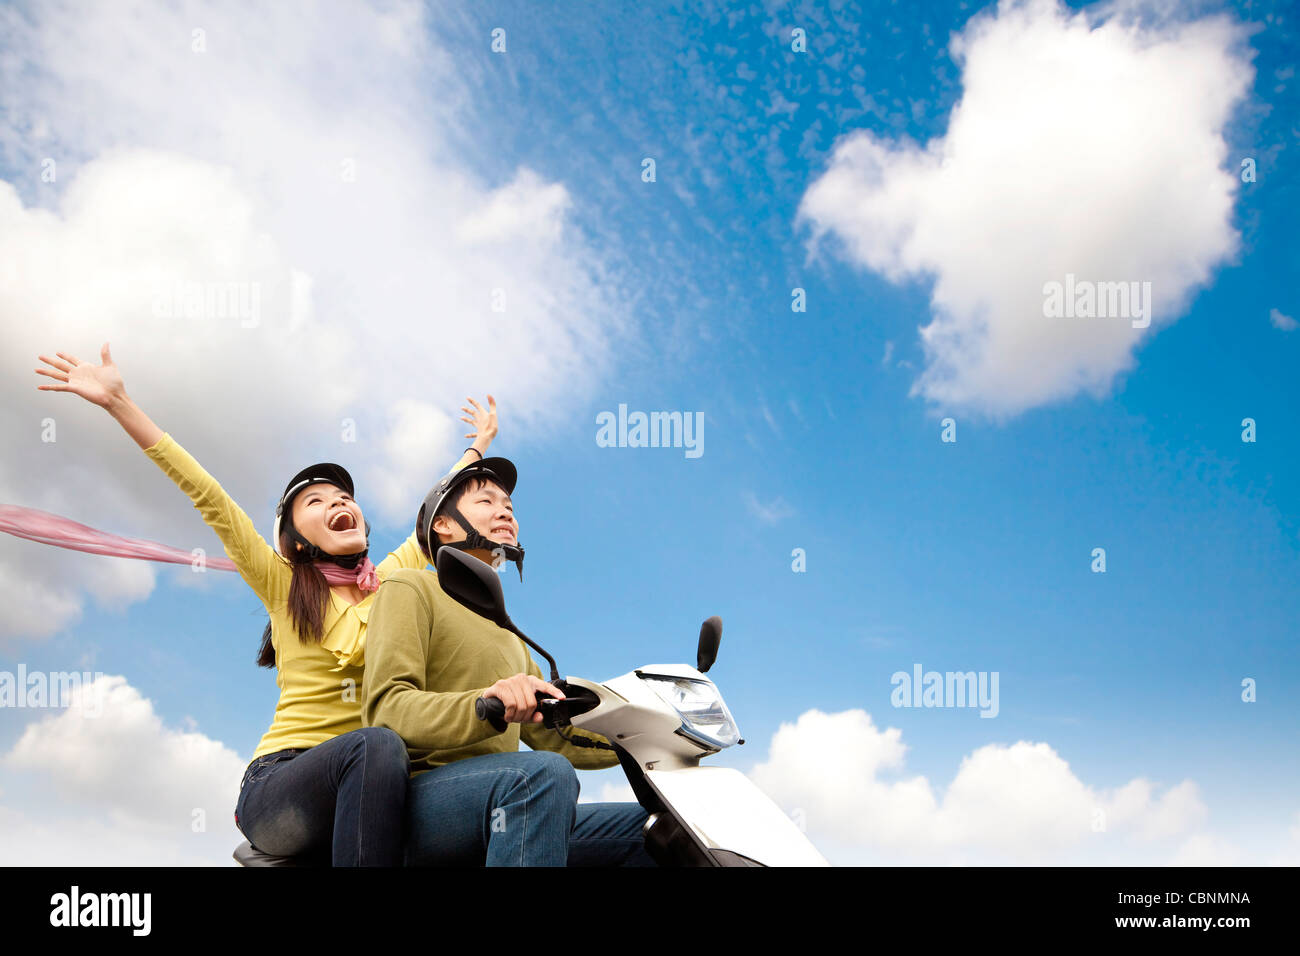 Feliz pareja joven divirtiéndose en un scooter Imagen De Stock